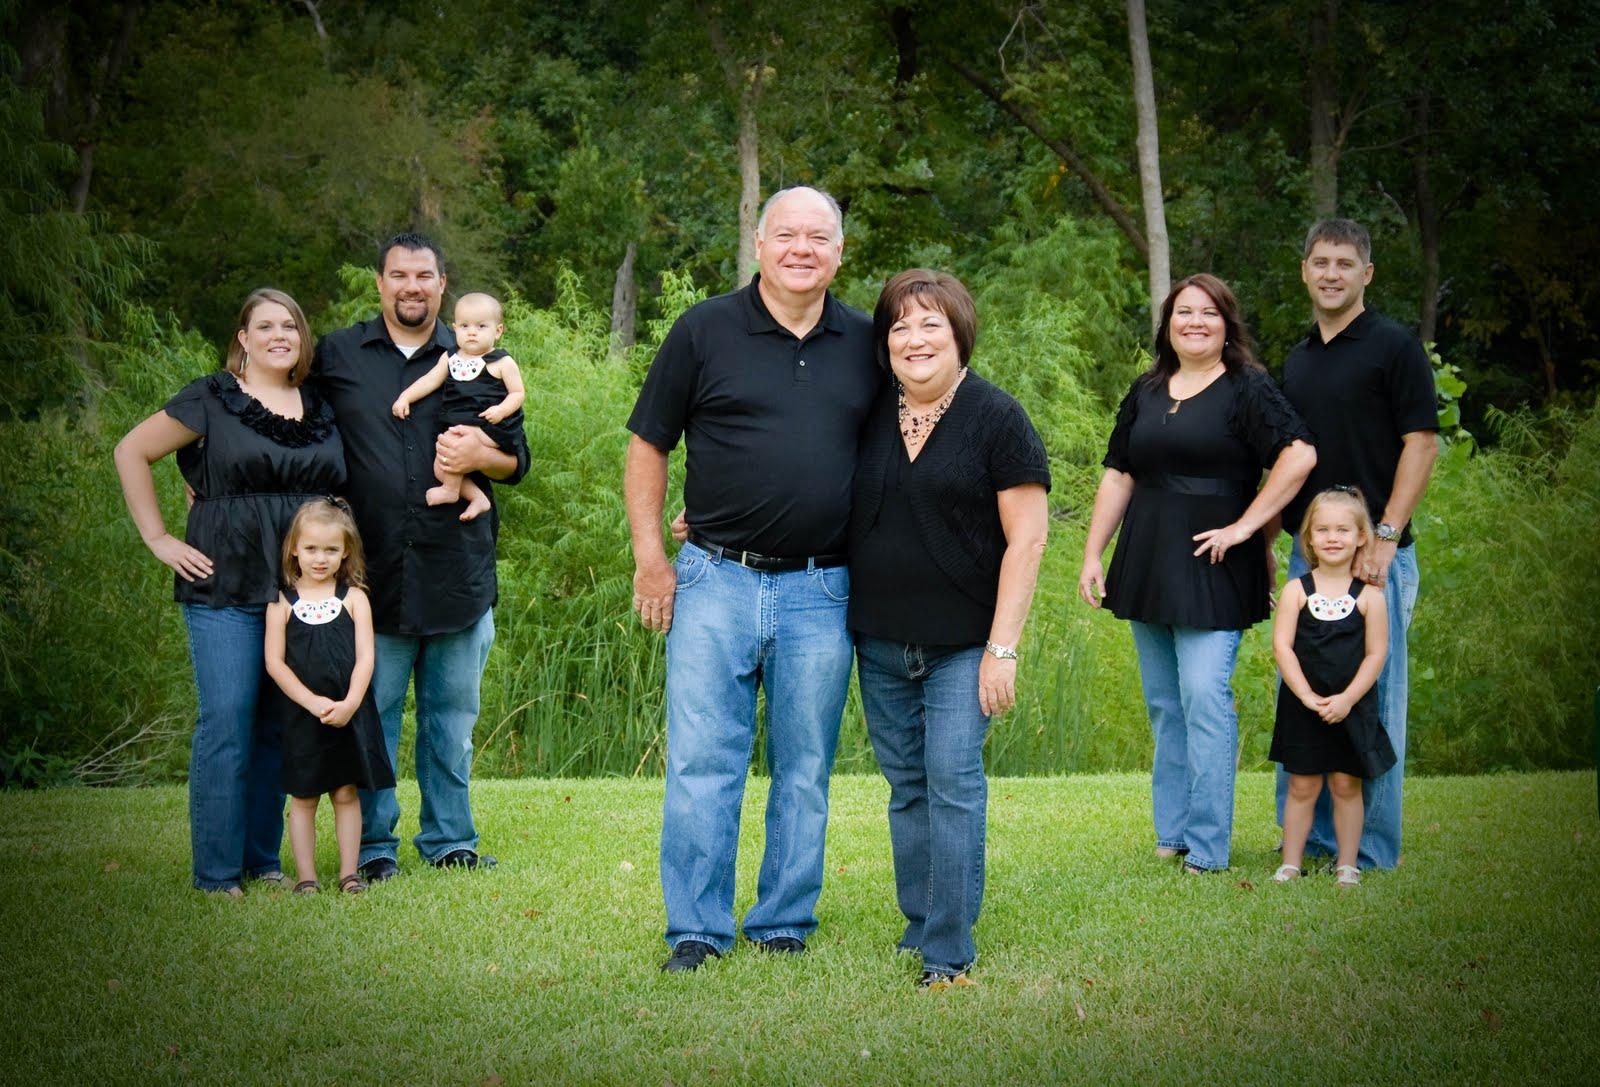 Backyard Family Portrait Ideas :   Extended Family Portraits  DallasFort Worth Family Photographer